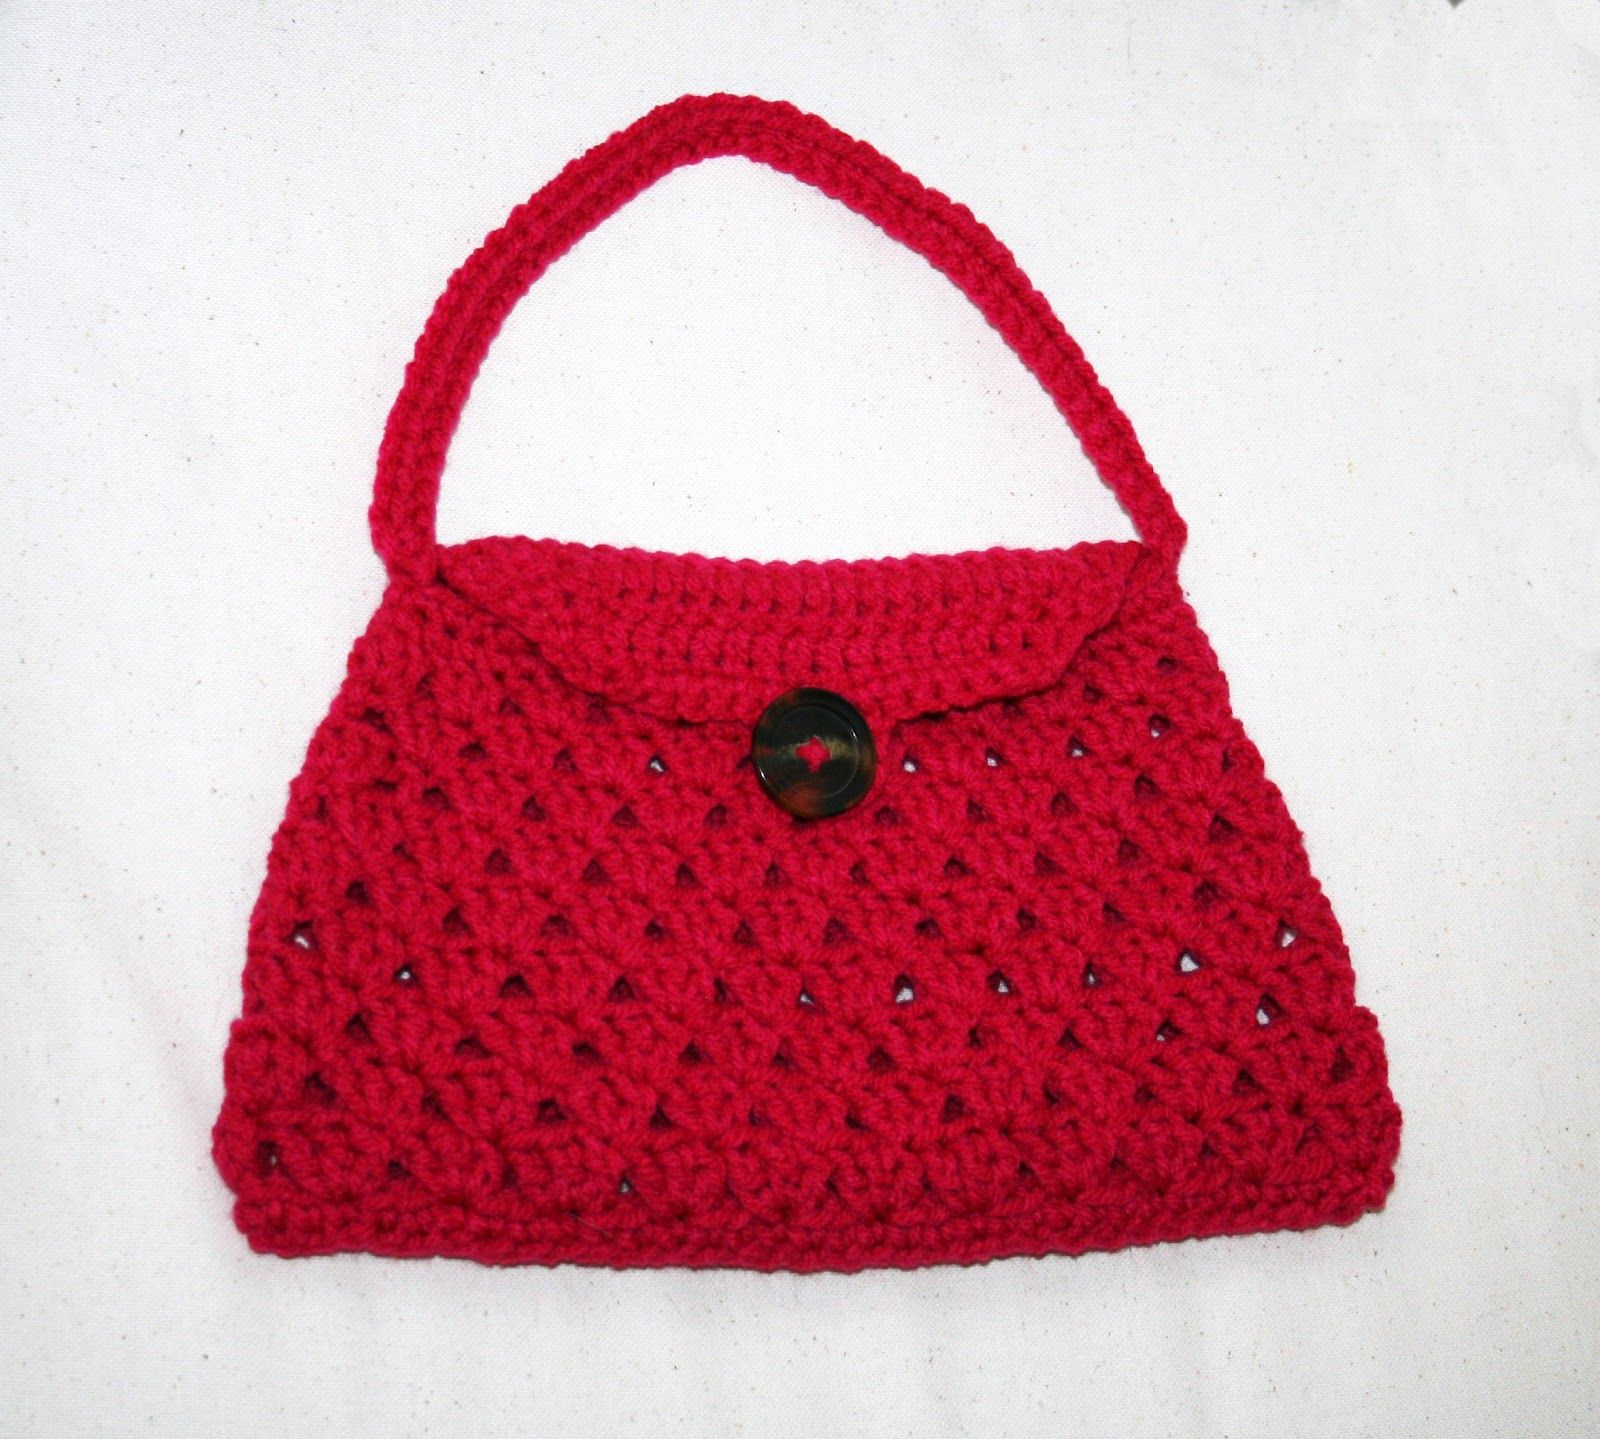 Stylish crochet handbag by megan denham free crochet pattern stylish crochet handbag by megan denham free crochet pattern ravelry bankloansurffo Gallery